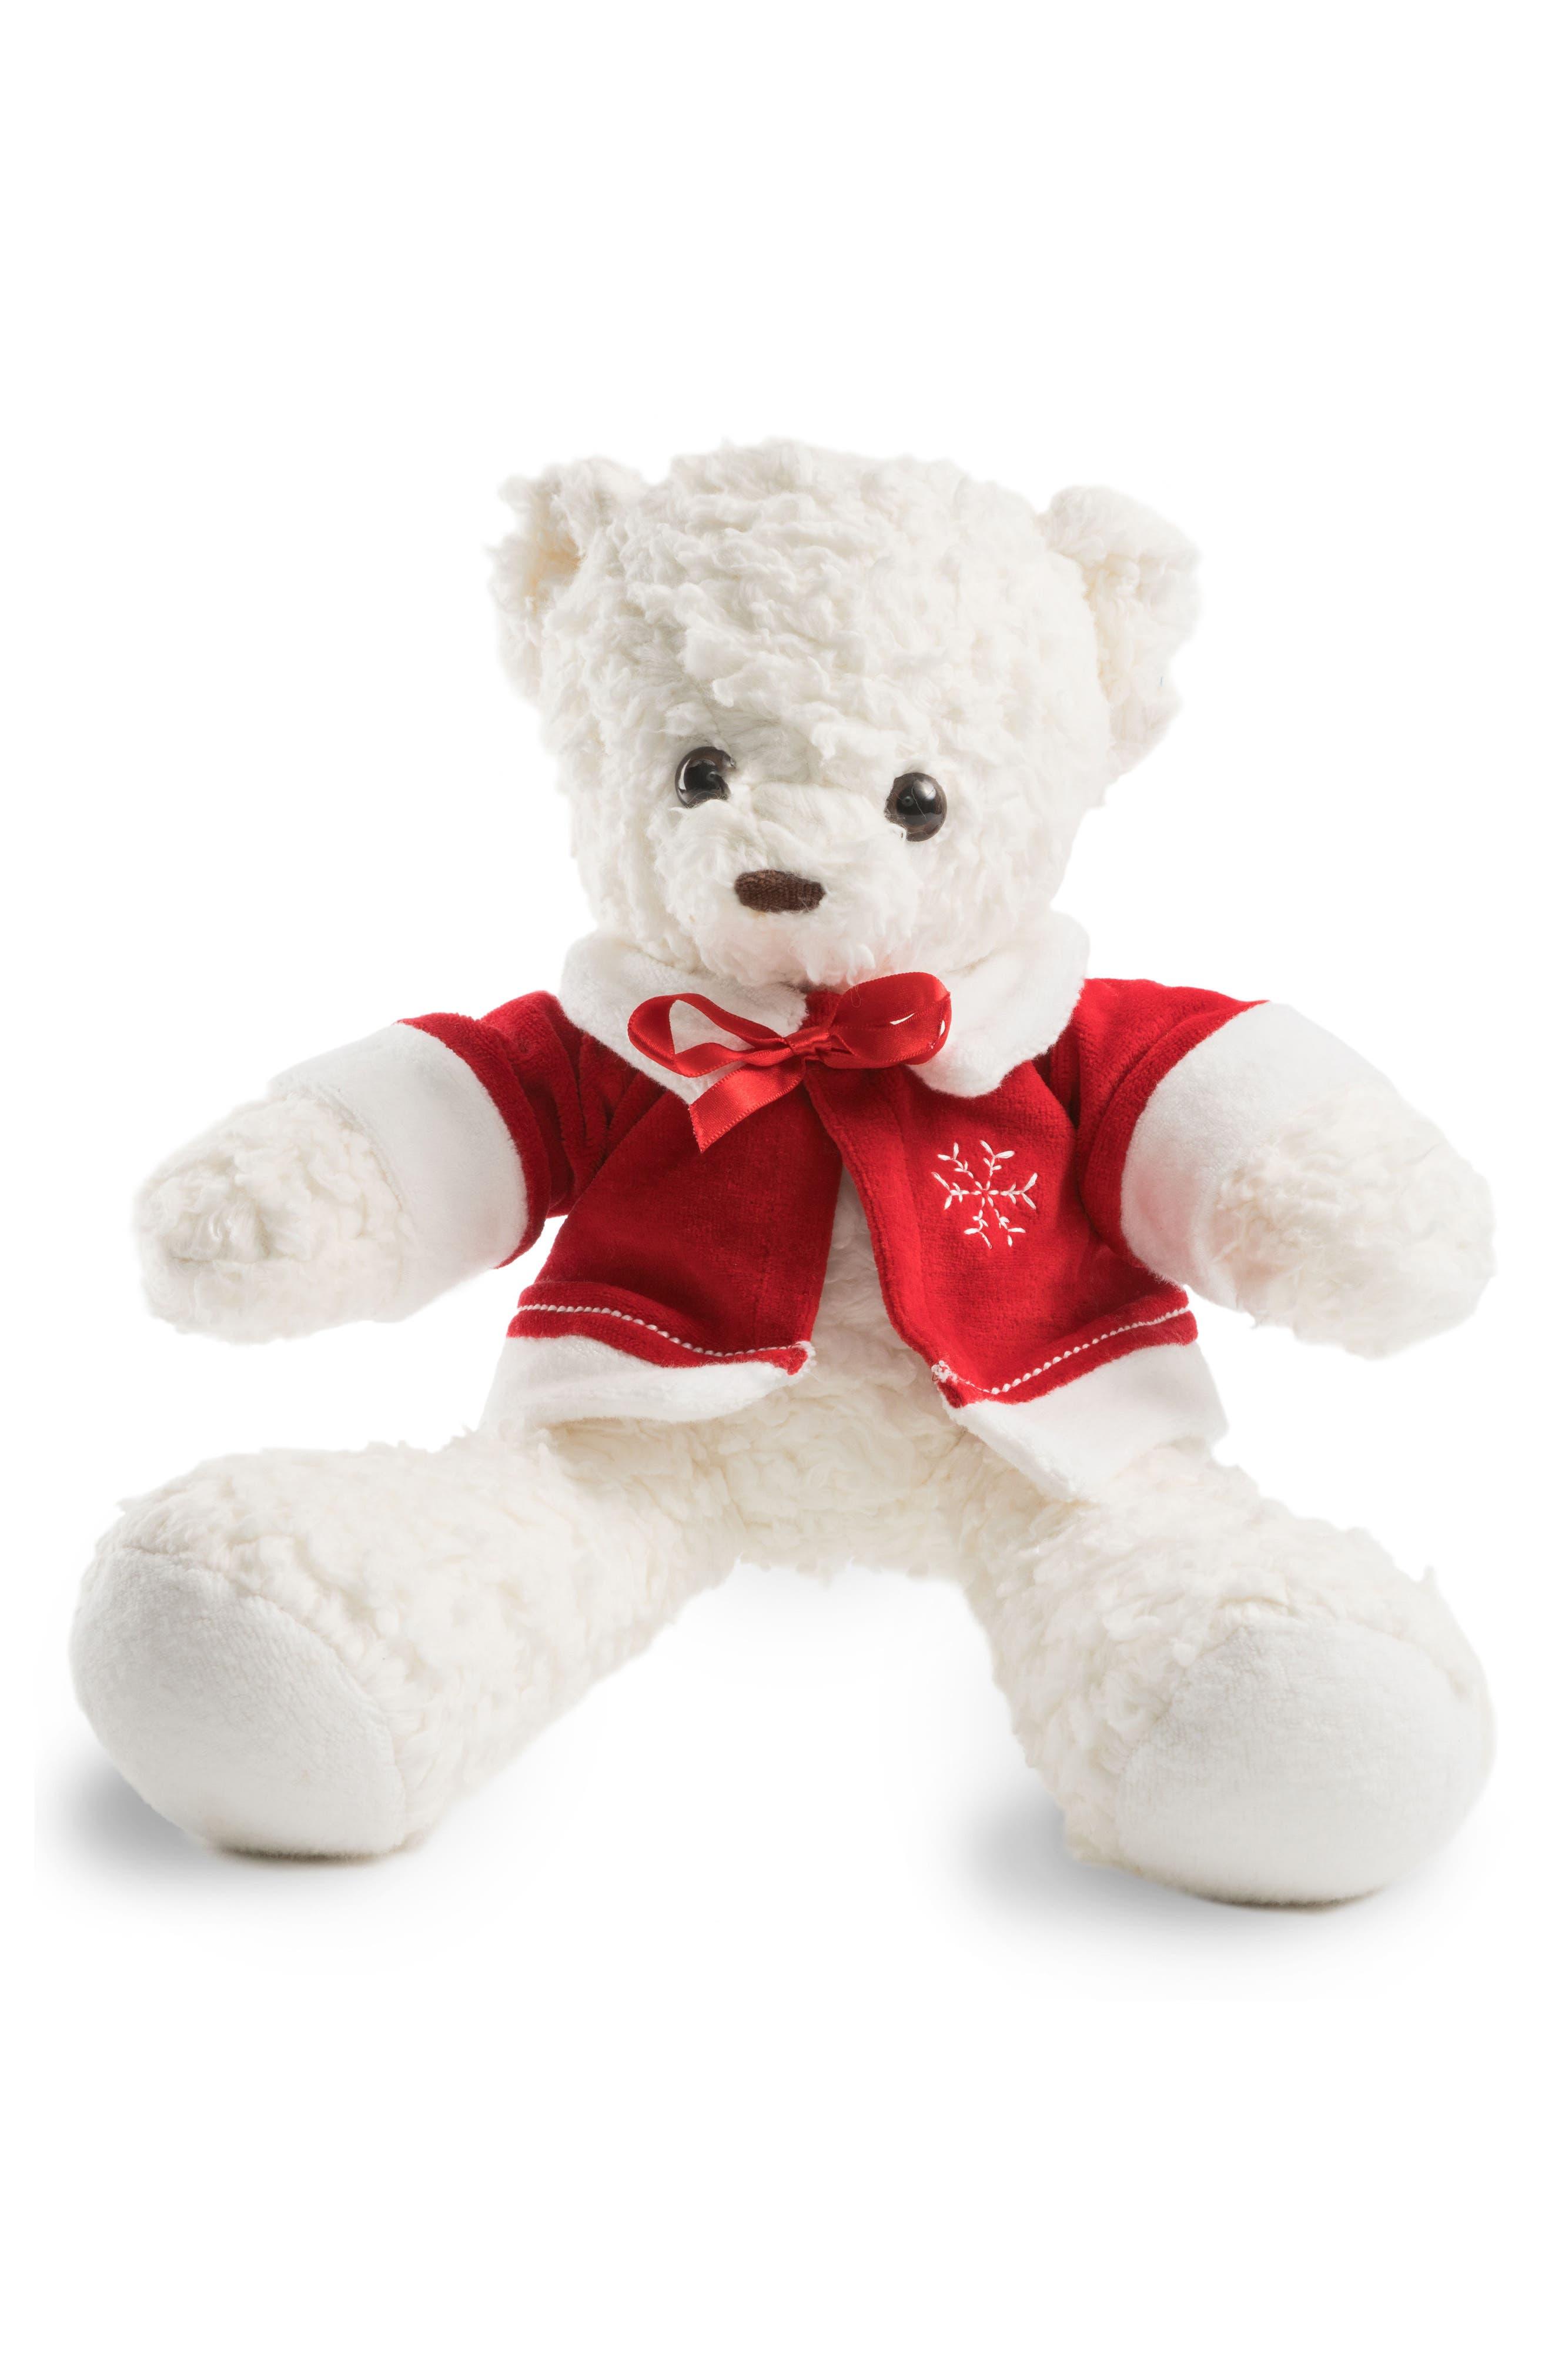 Medium Stuffed Bear with Holiday Jacket,                         Main,                         color, White